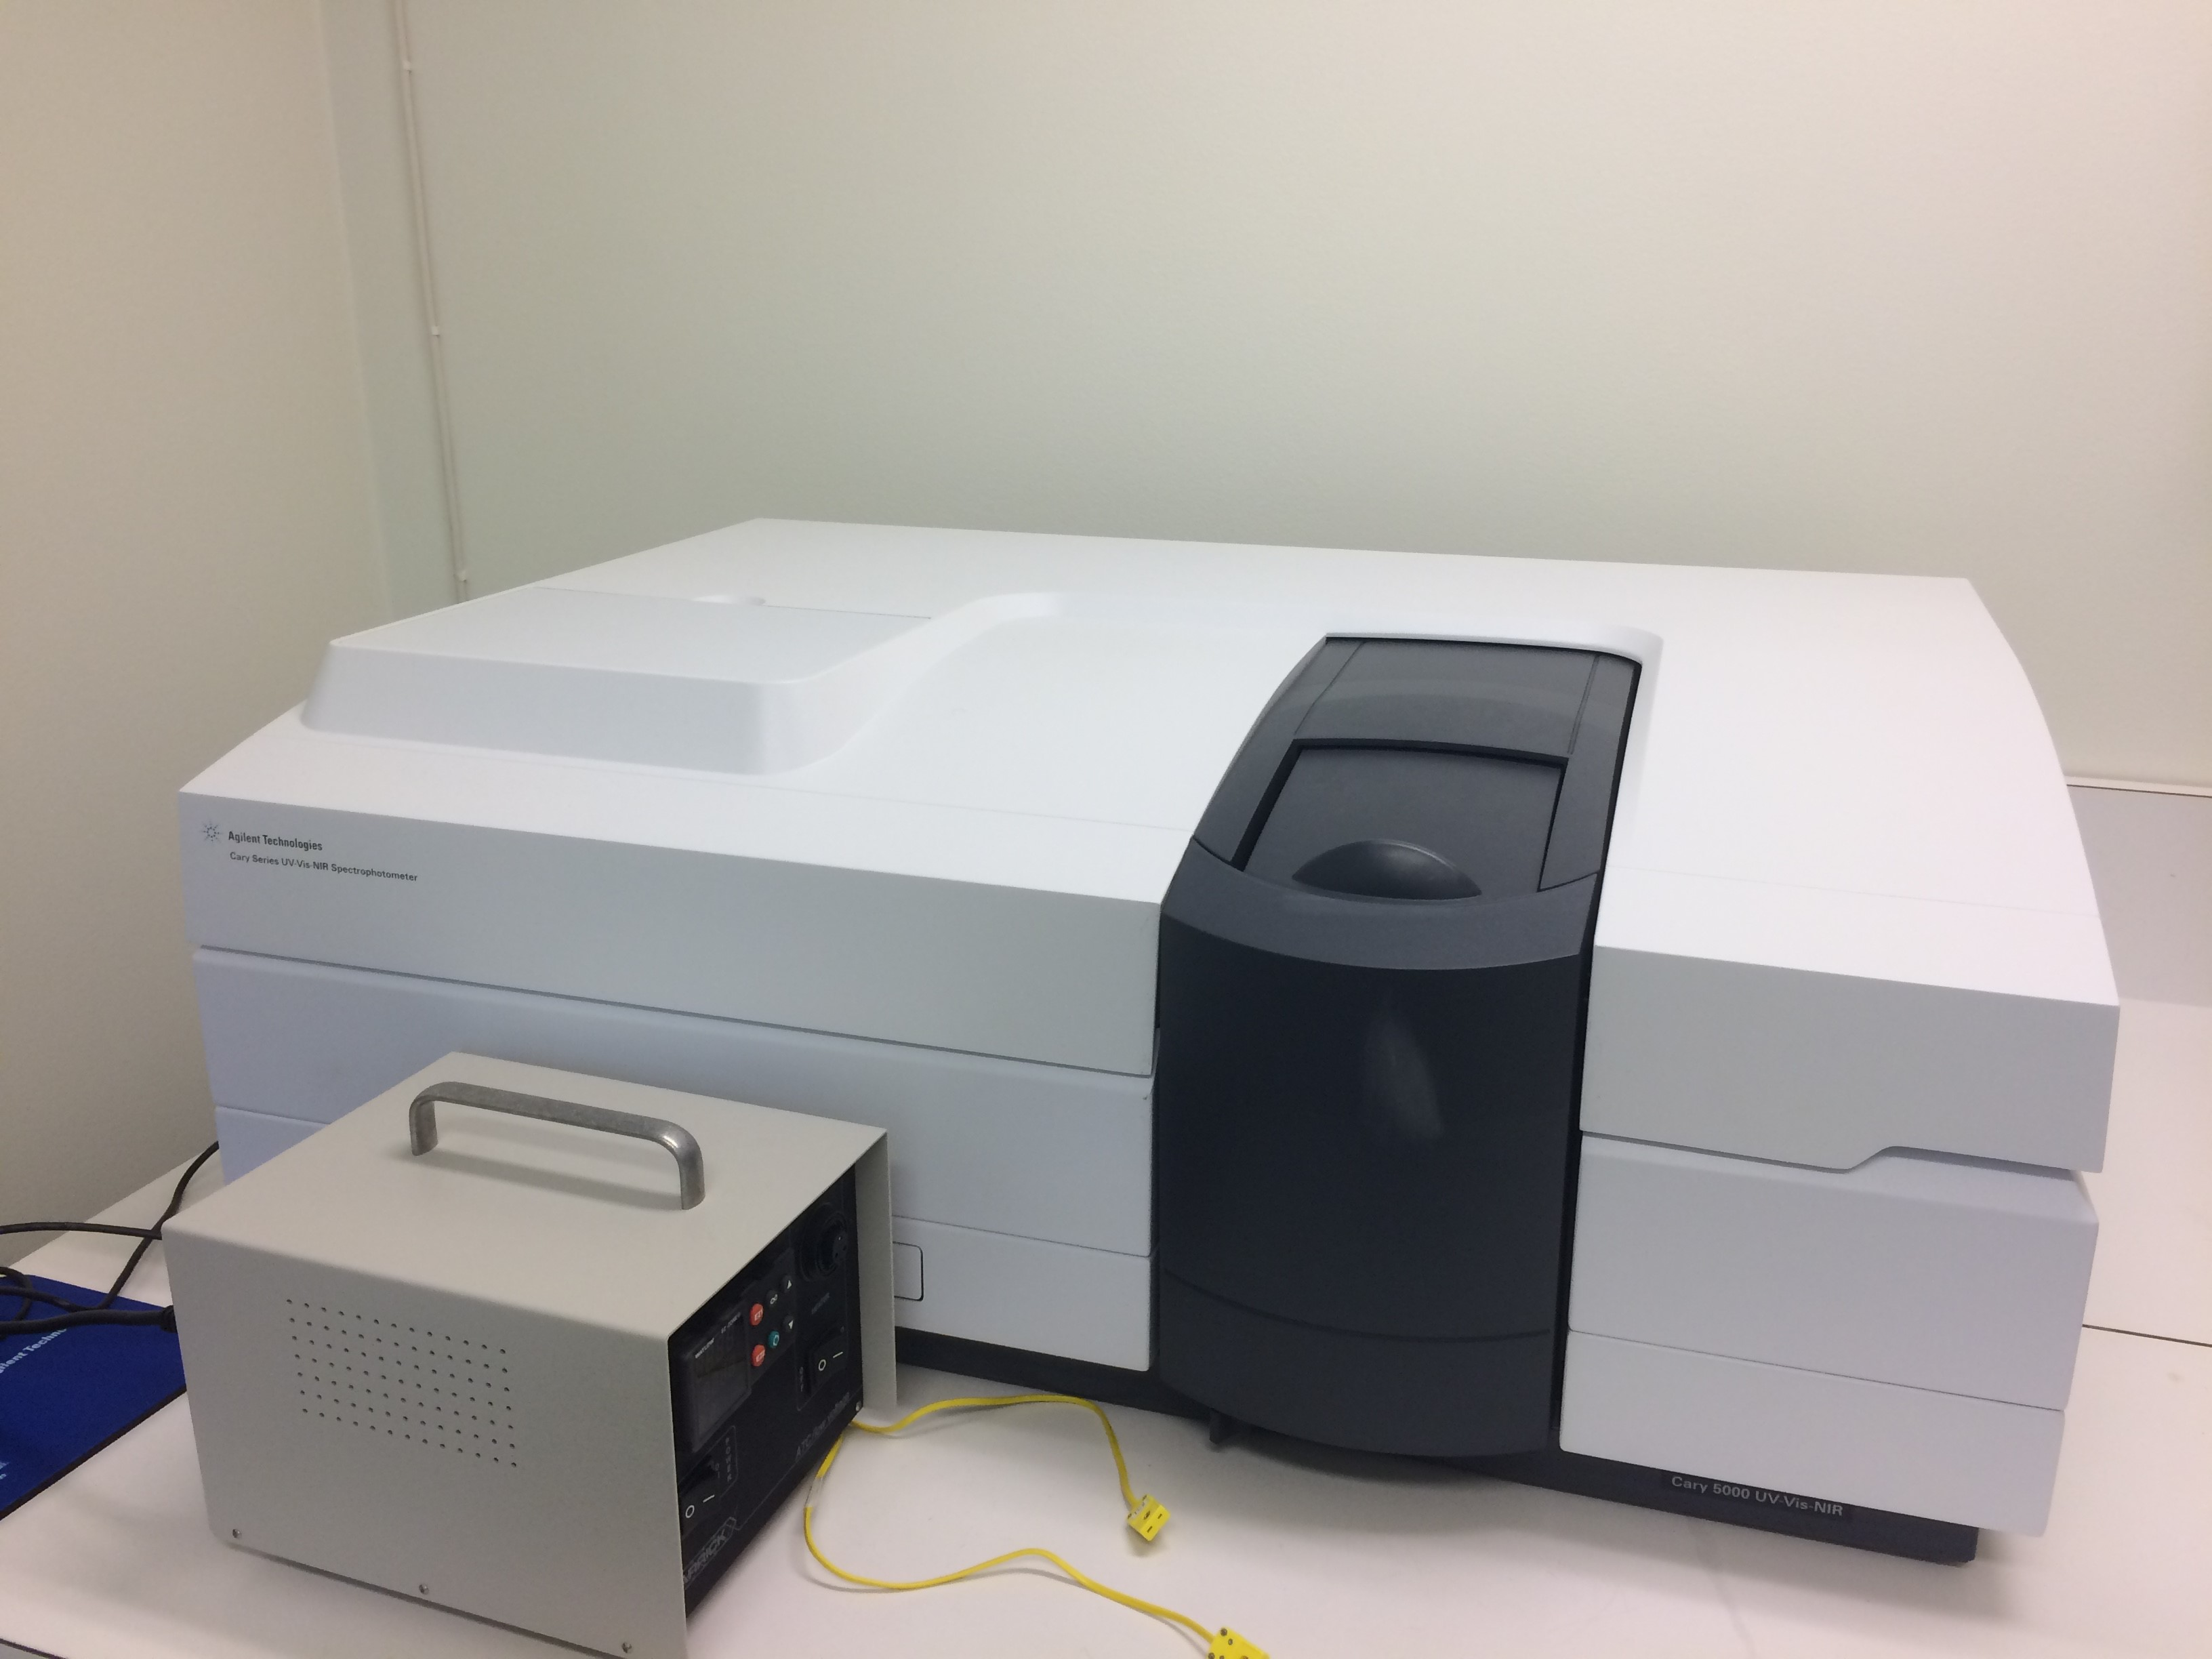 Picture of Agilent Cary 5000 UV/Vis/NIR spectrometer